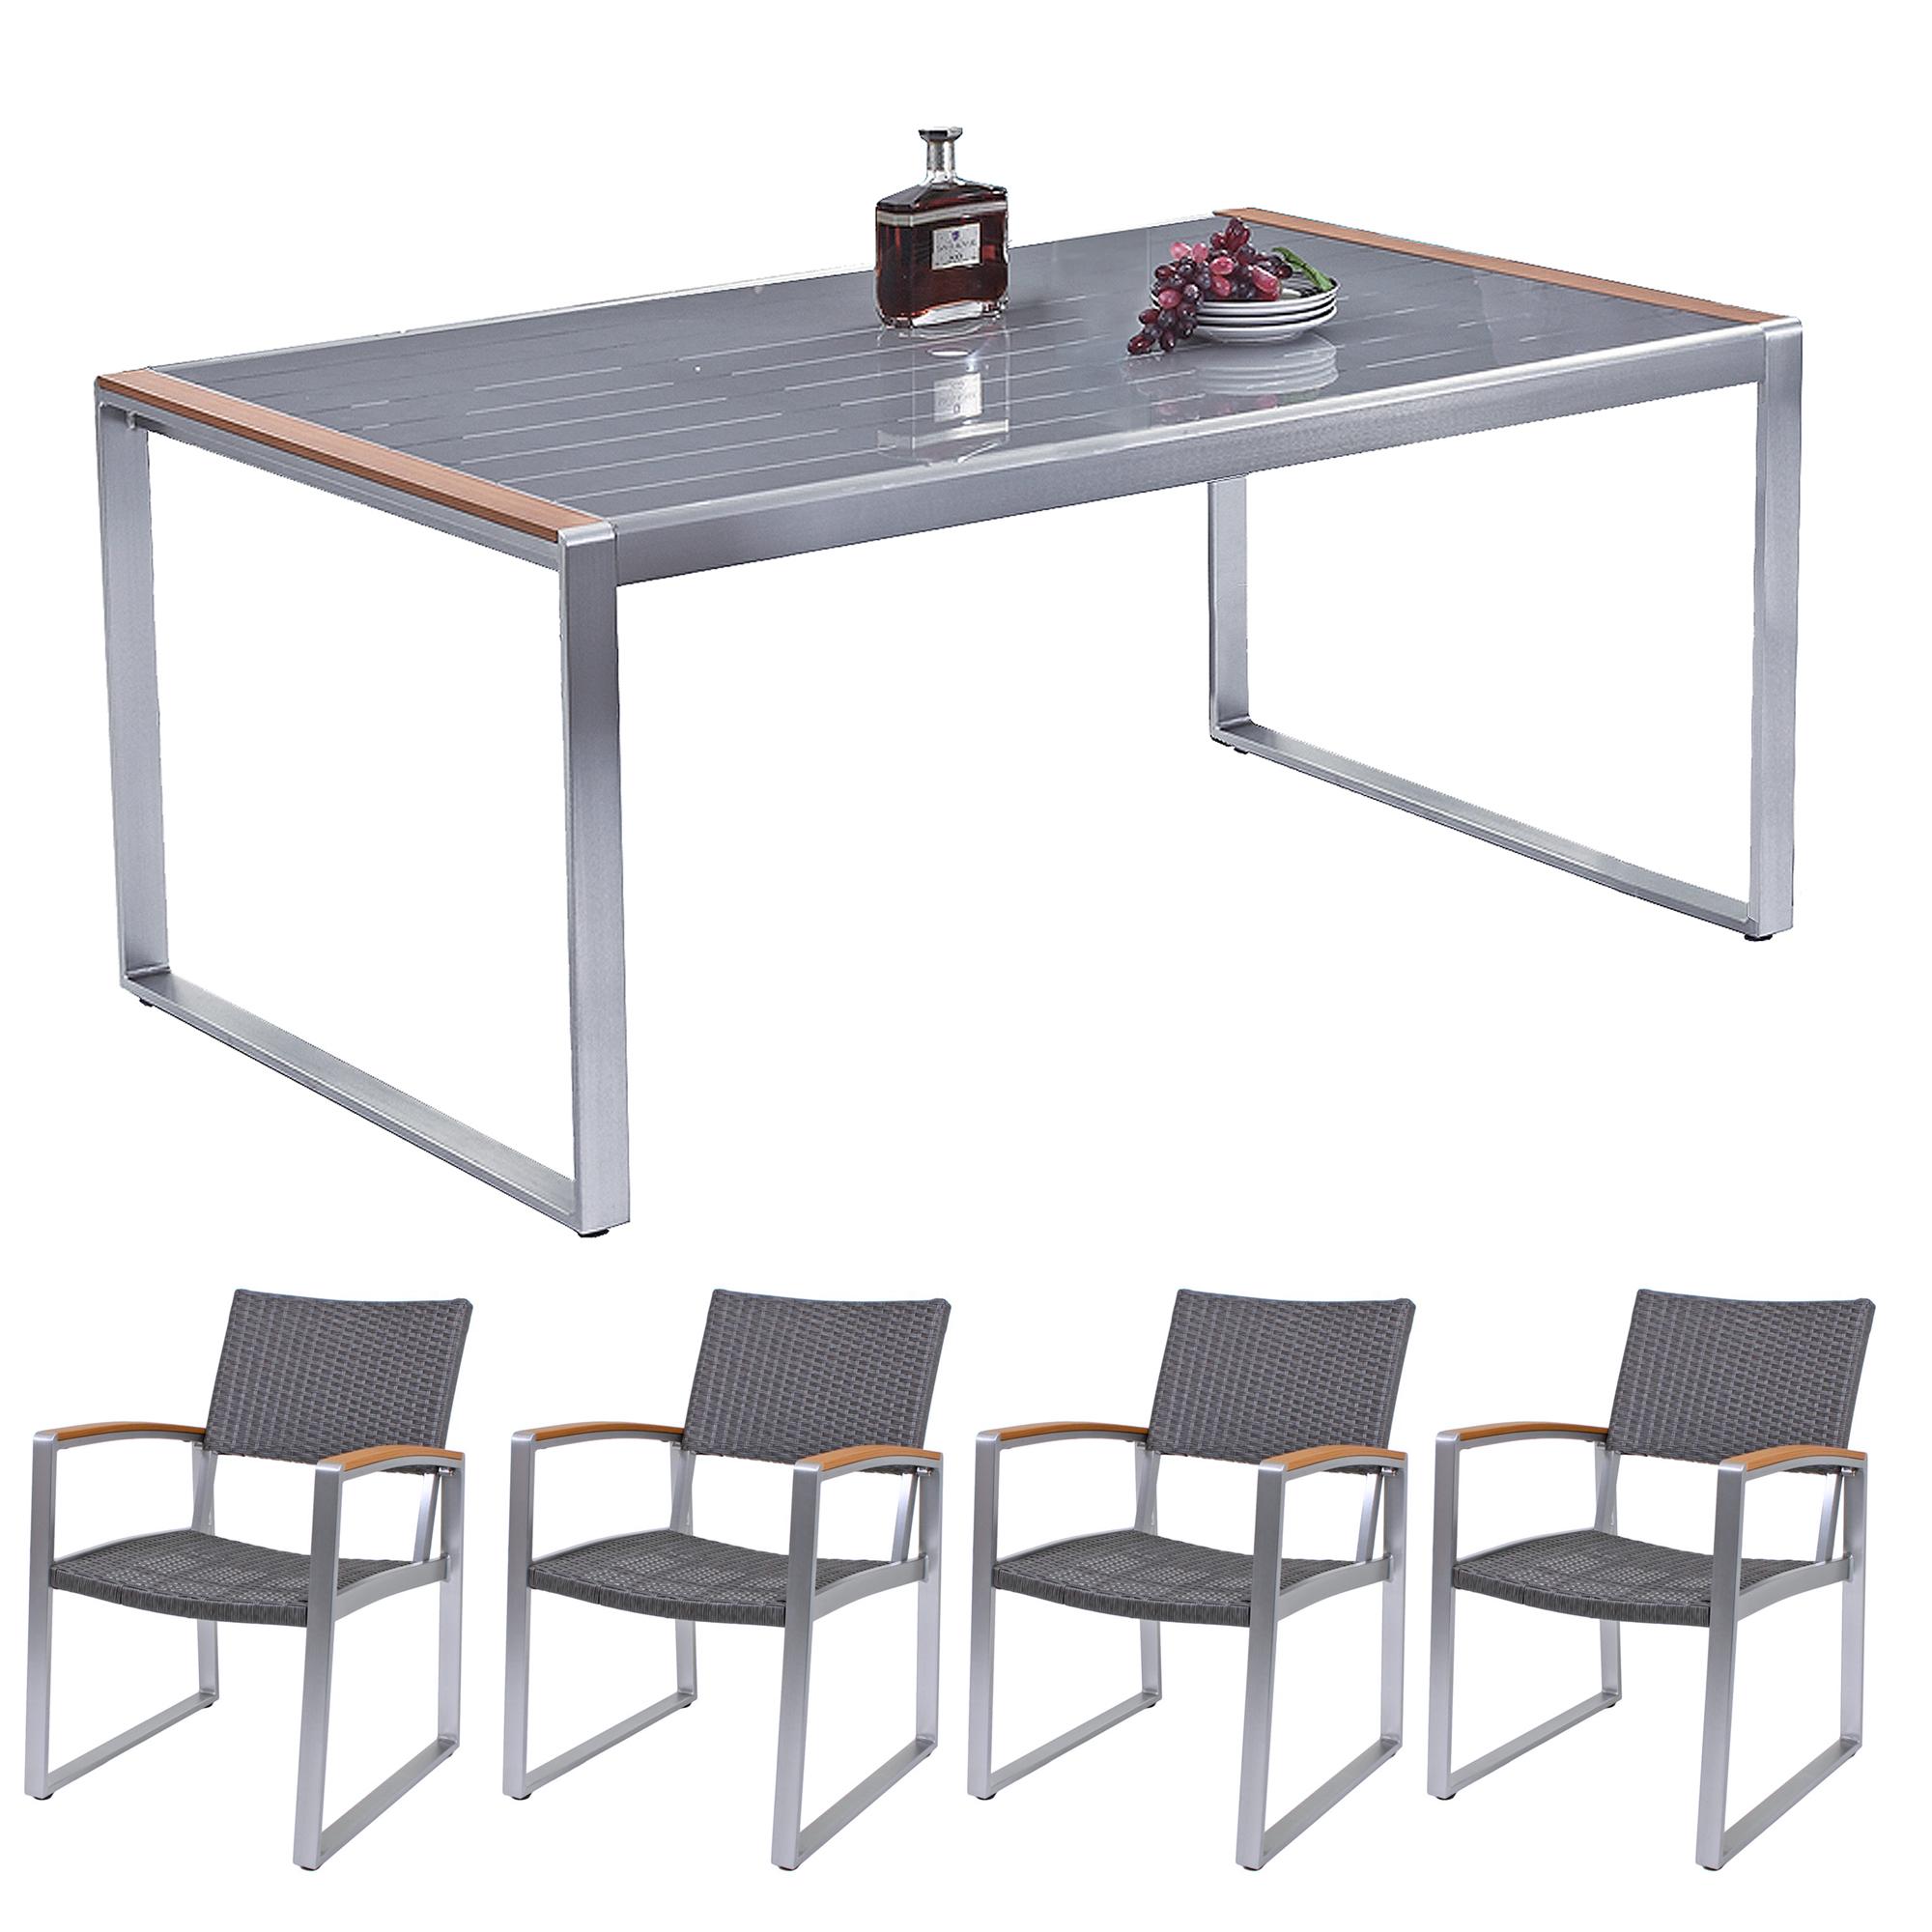 sitzgruppe gartenm bel set 5tlg set alu gartenset essgruppe garnitur tisch set ebay. Black Bedroom Furniture Sets. Home Design Ideas